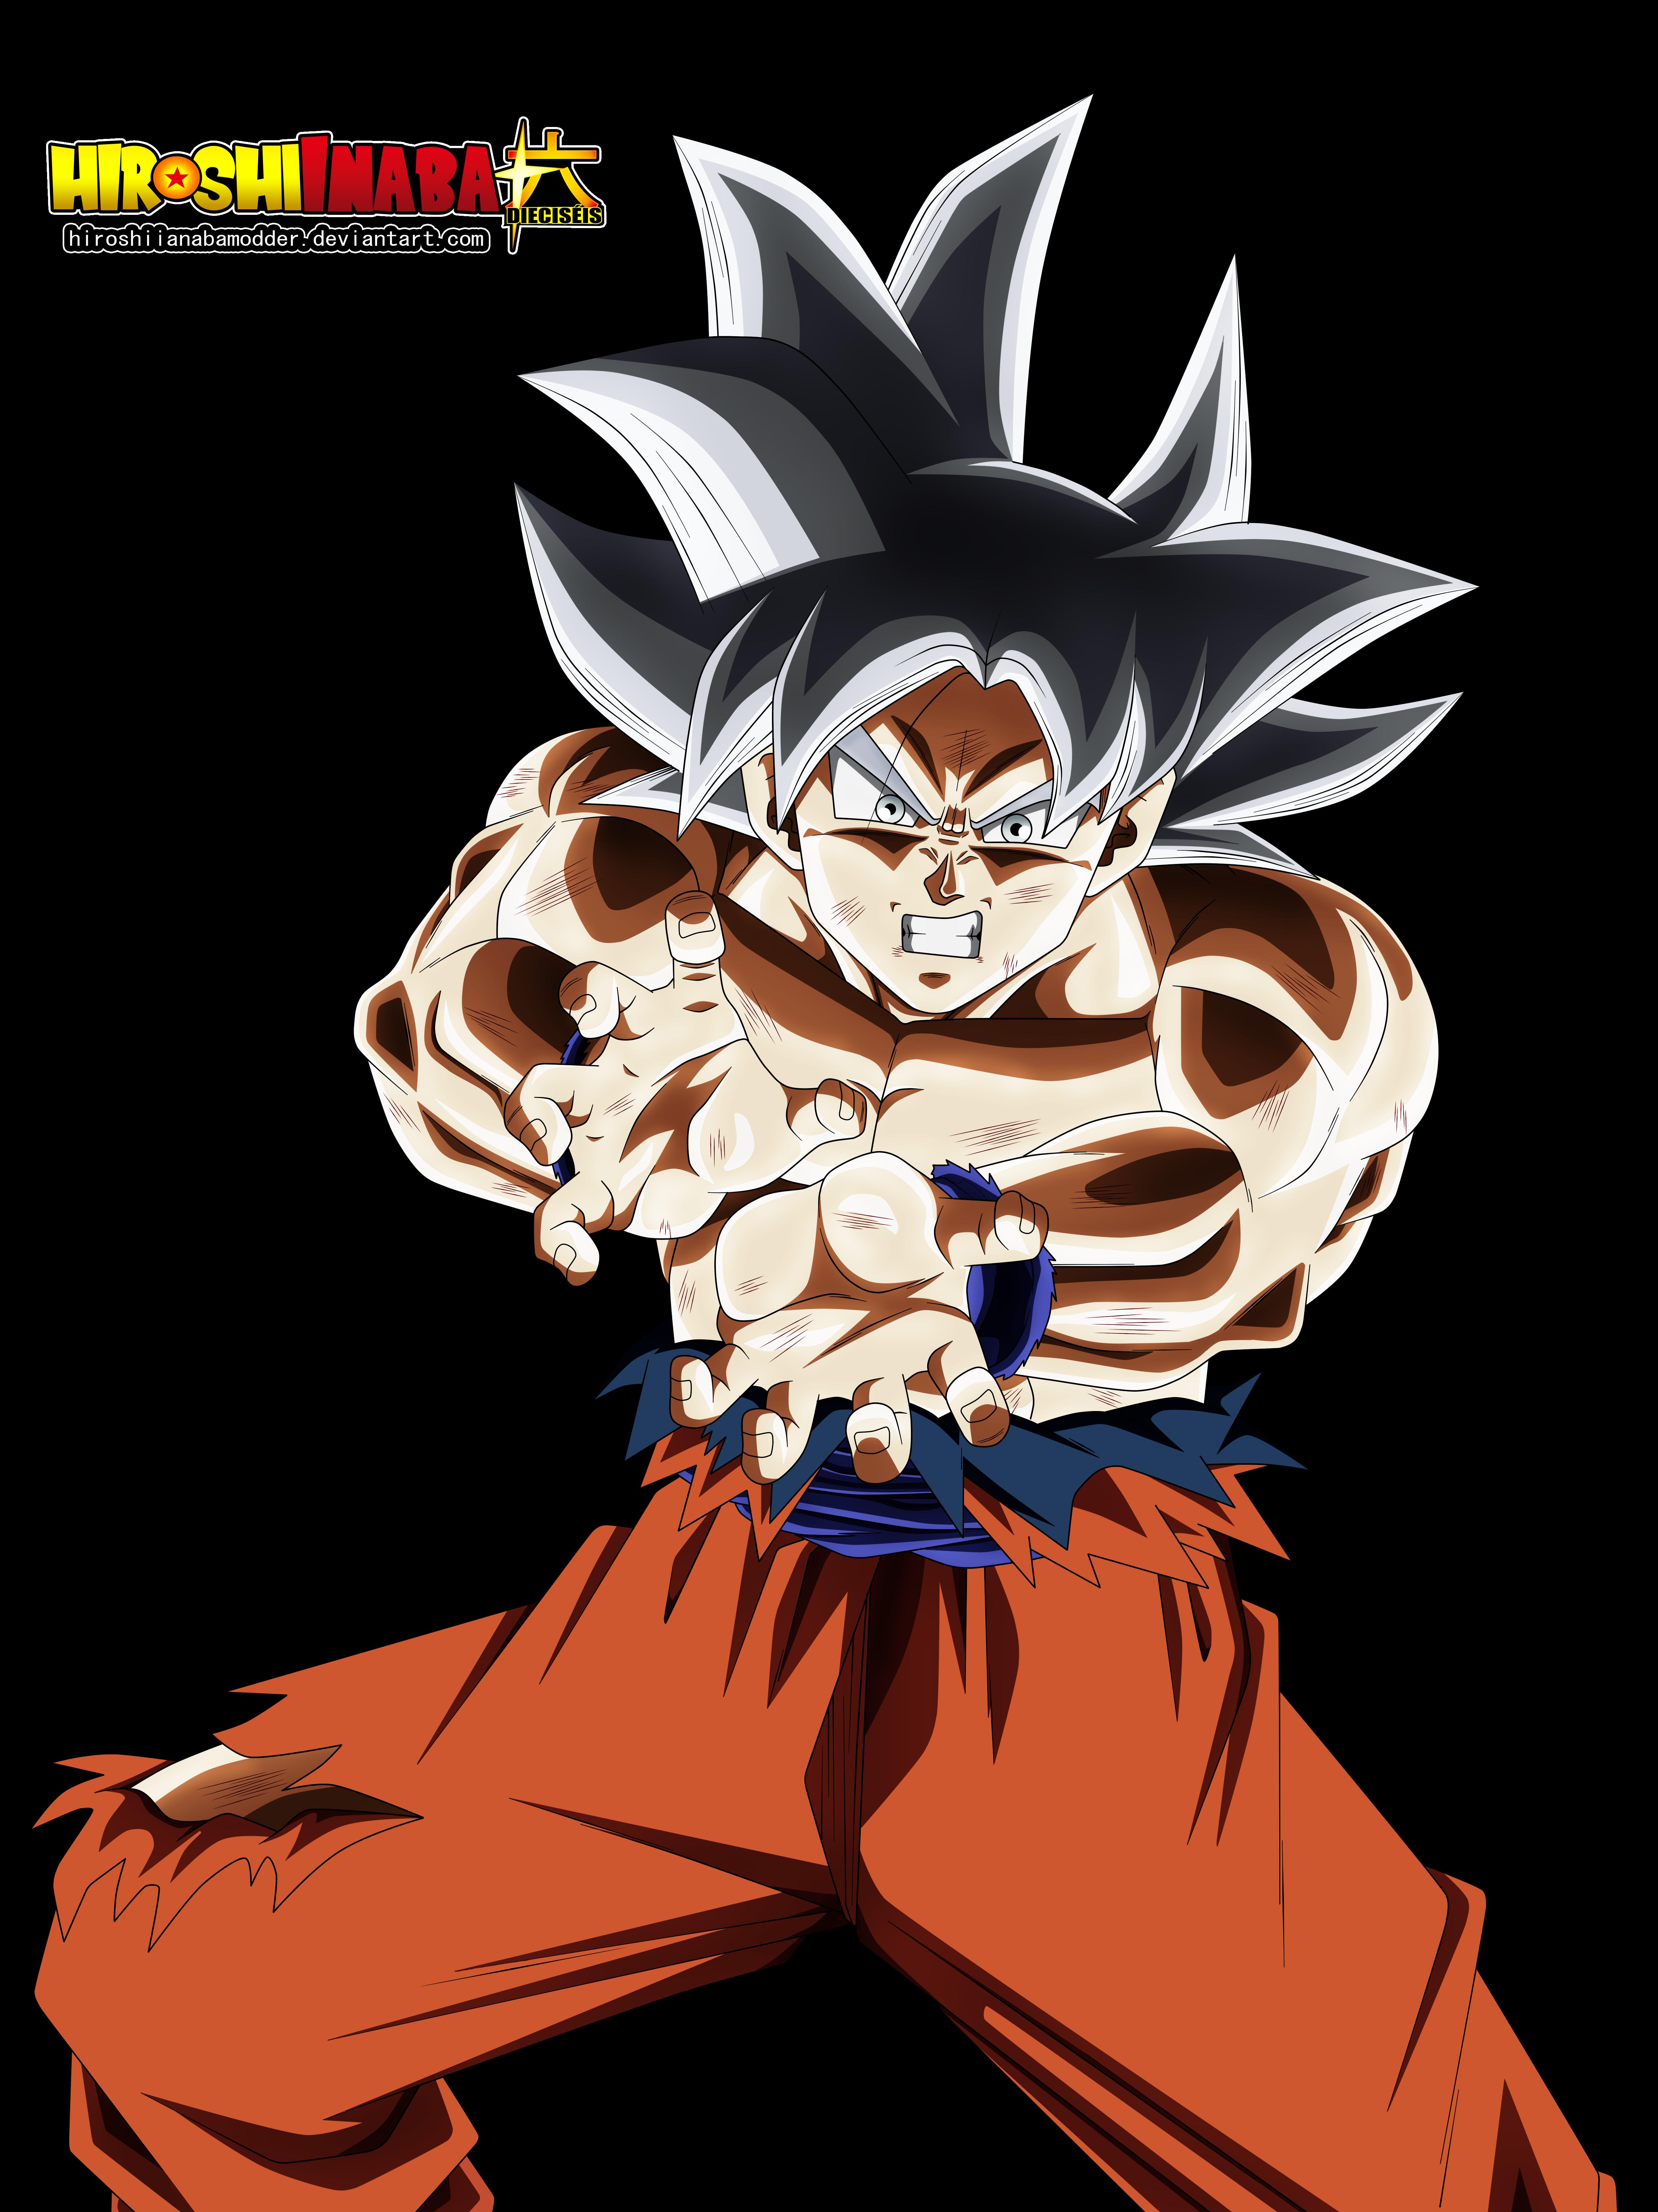 Goku Ultra Instinto Perfecto By Hiroshiianabamodder On Deviantart